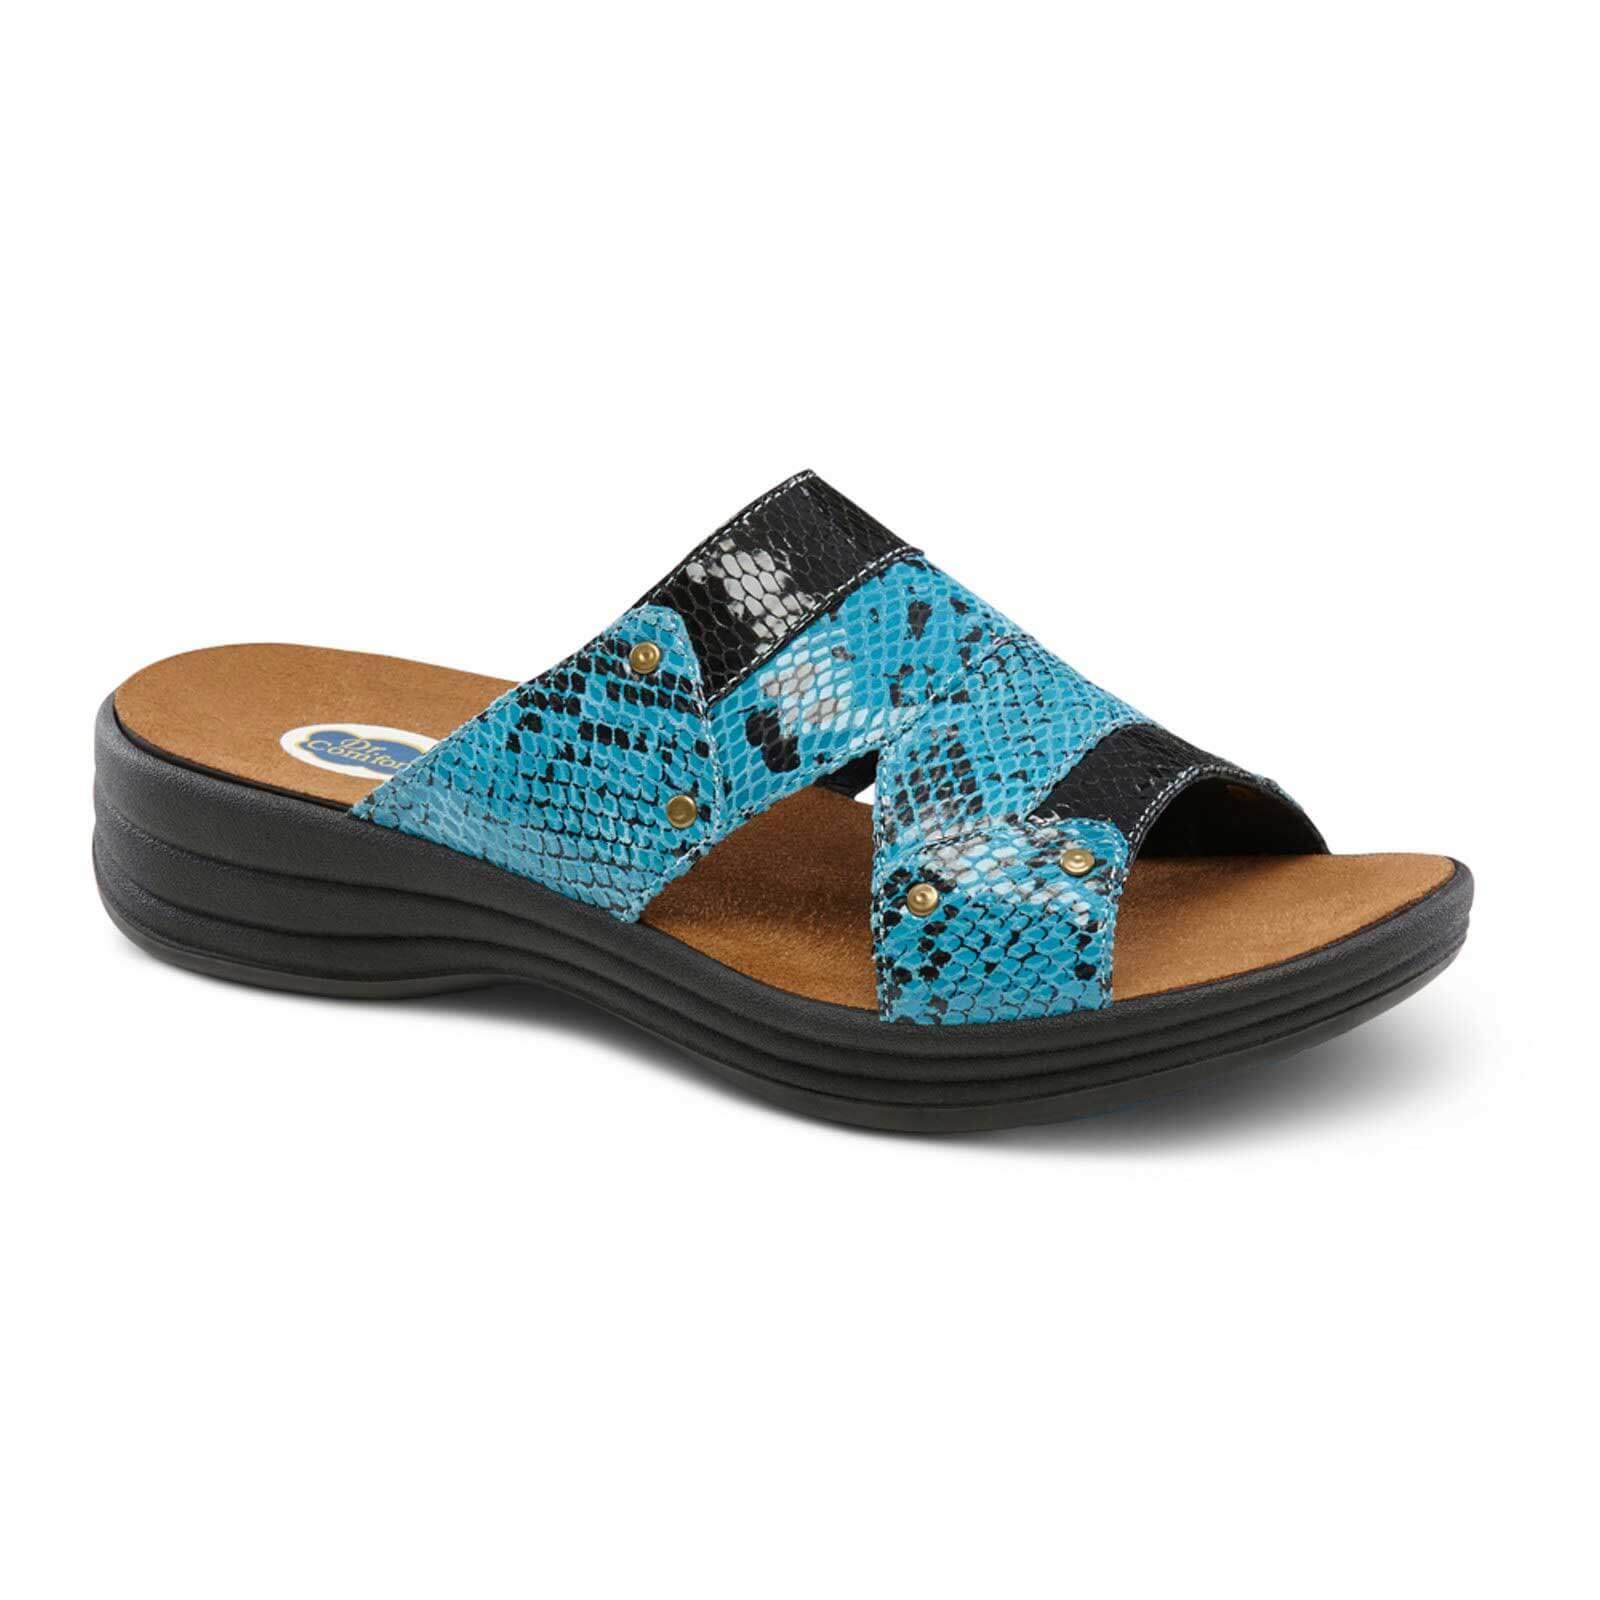 dr comfort shoes 039 s comfort sandal